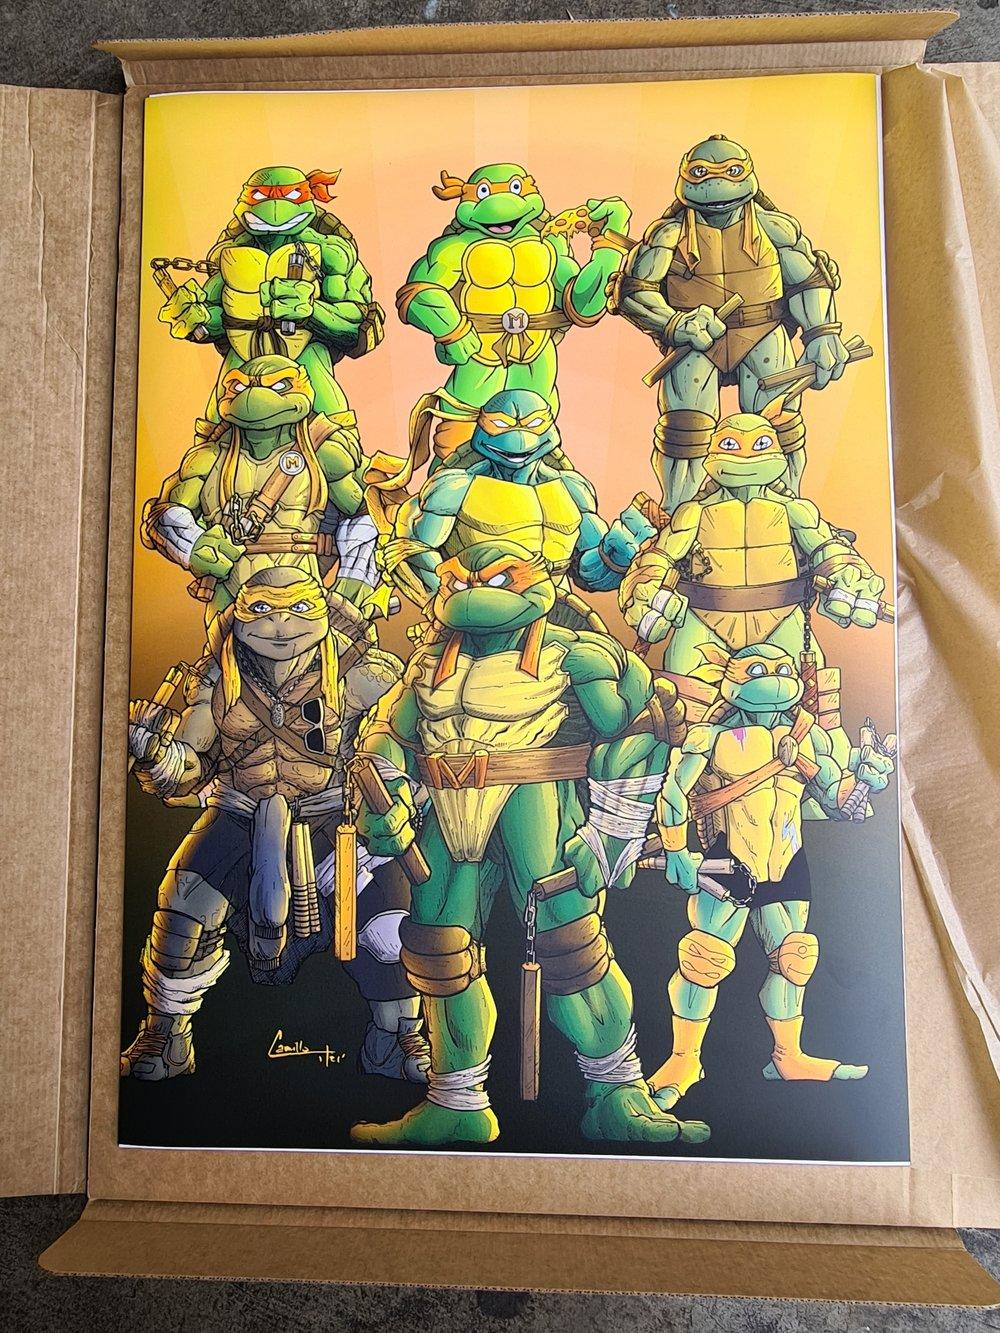 Michelangelo through the ages art print